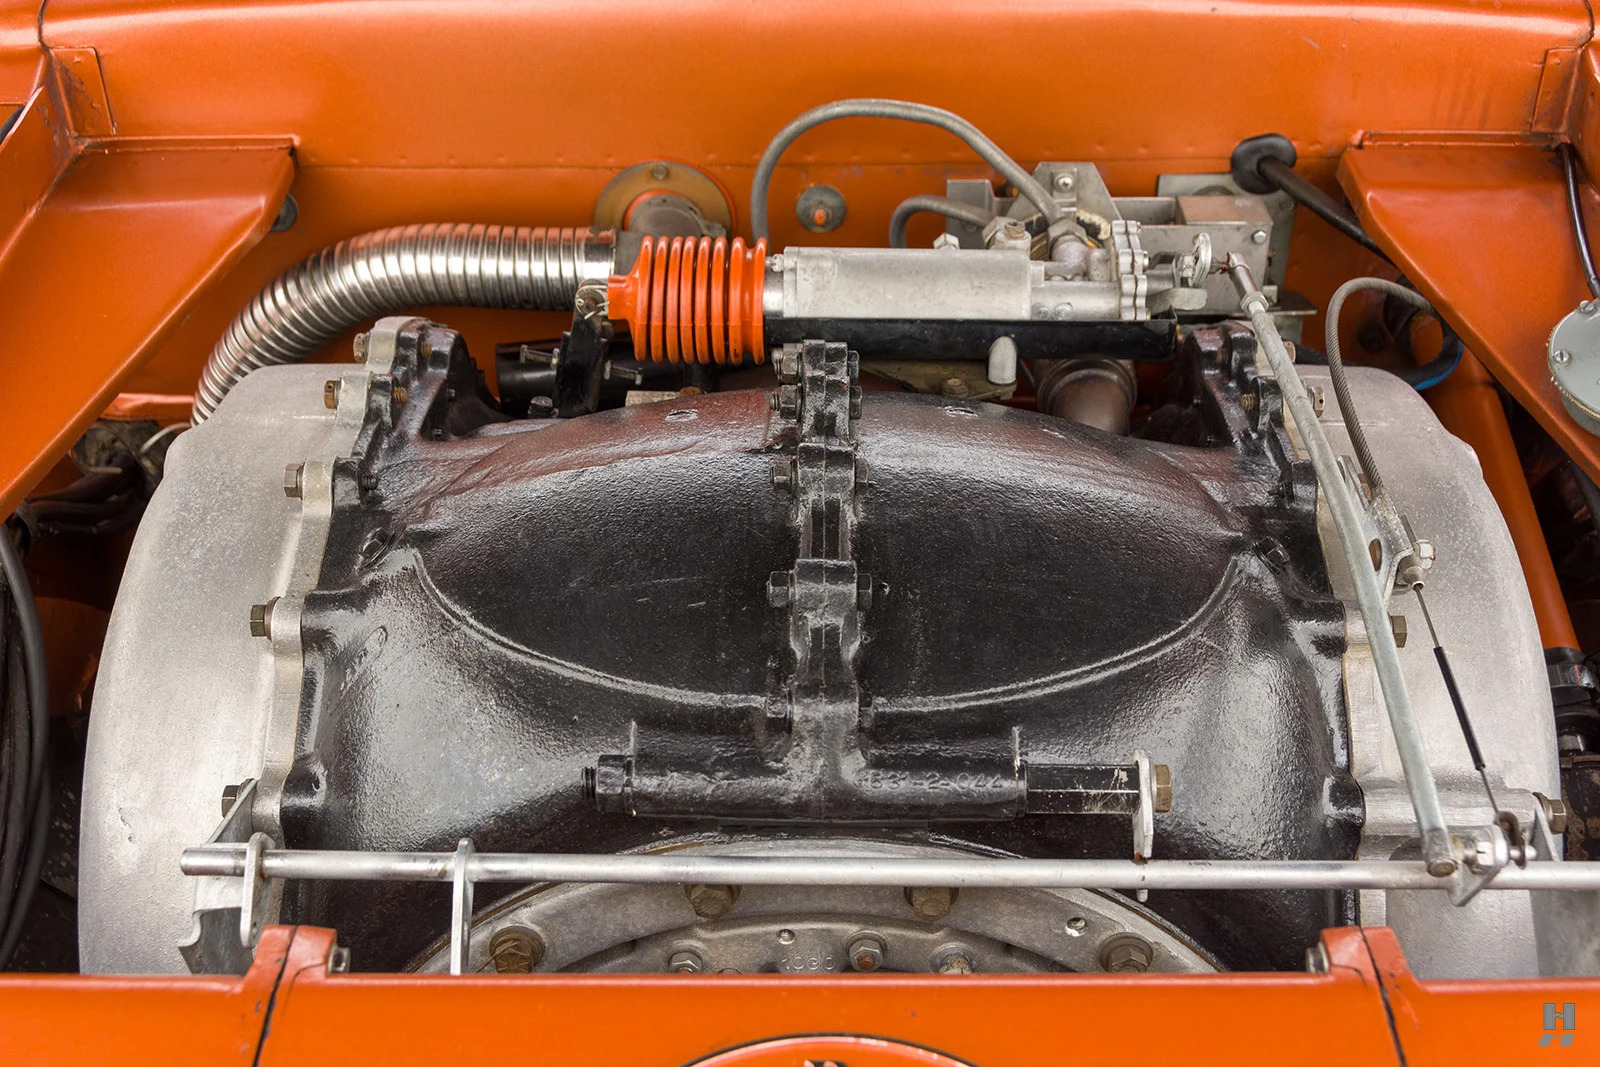 1963 Chrysler Turbine Car engine close